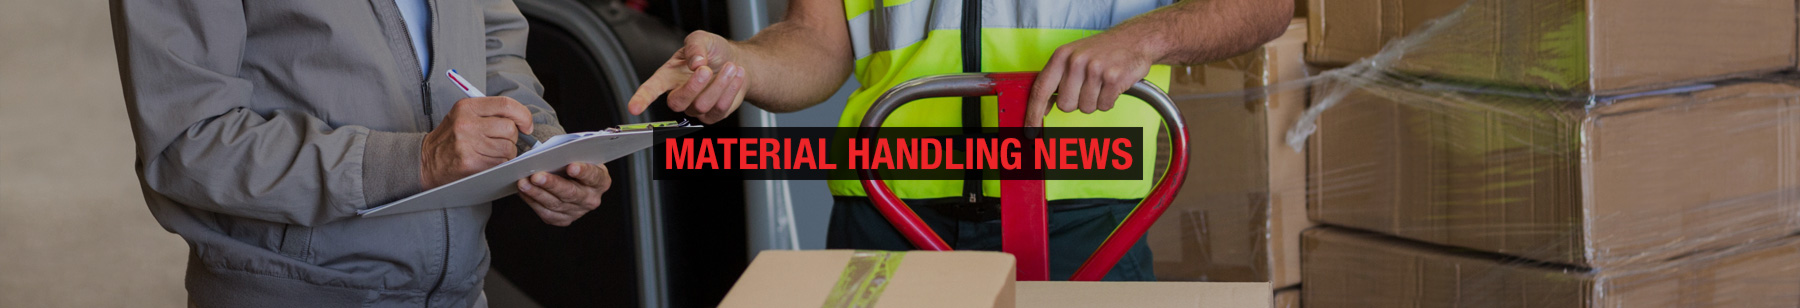 Blog for Material Handling Equipment in York County PA - Harford - Baltimore - Howard County MD - Mid-Atlantic Region